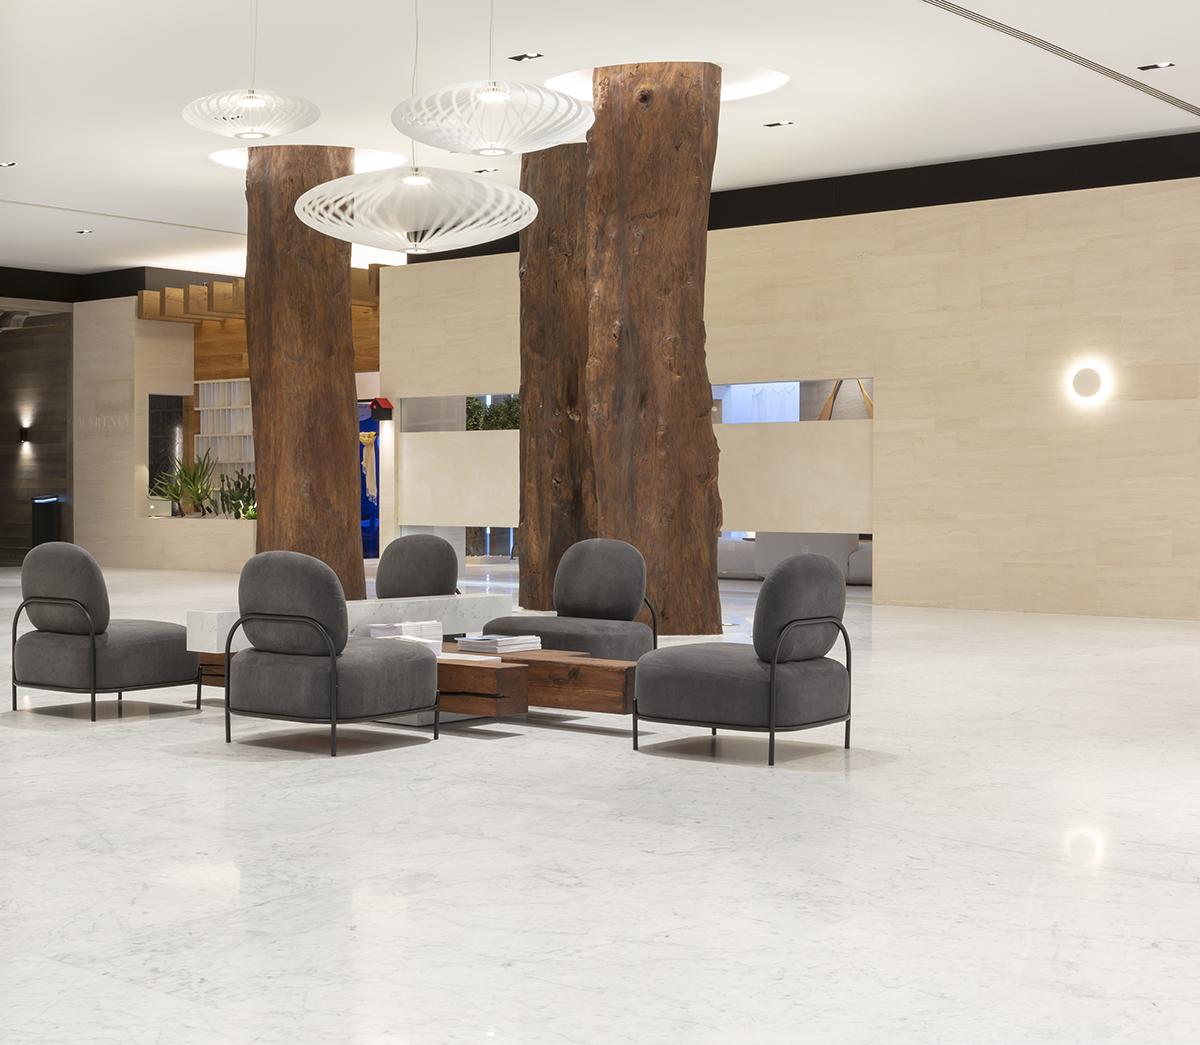 troncos-arboles-madera-natural-decoracion-contract